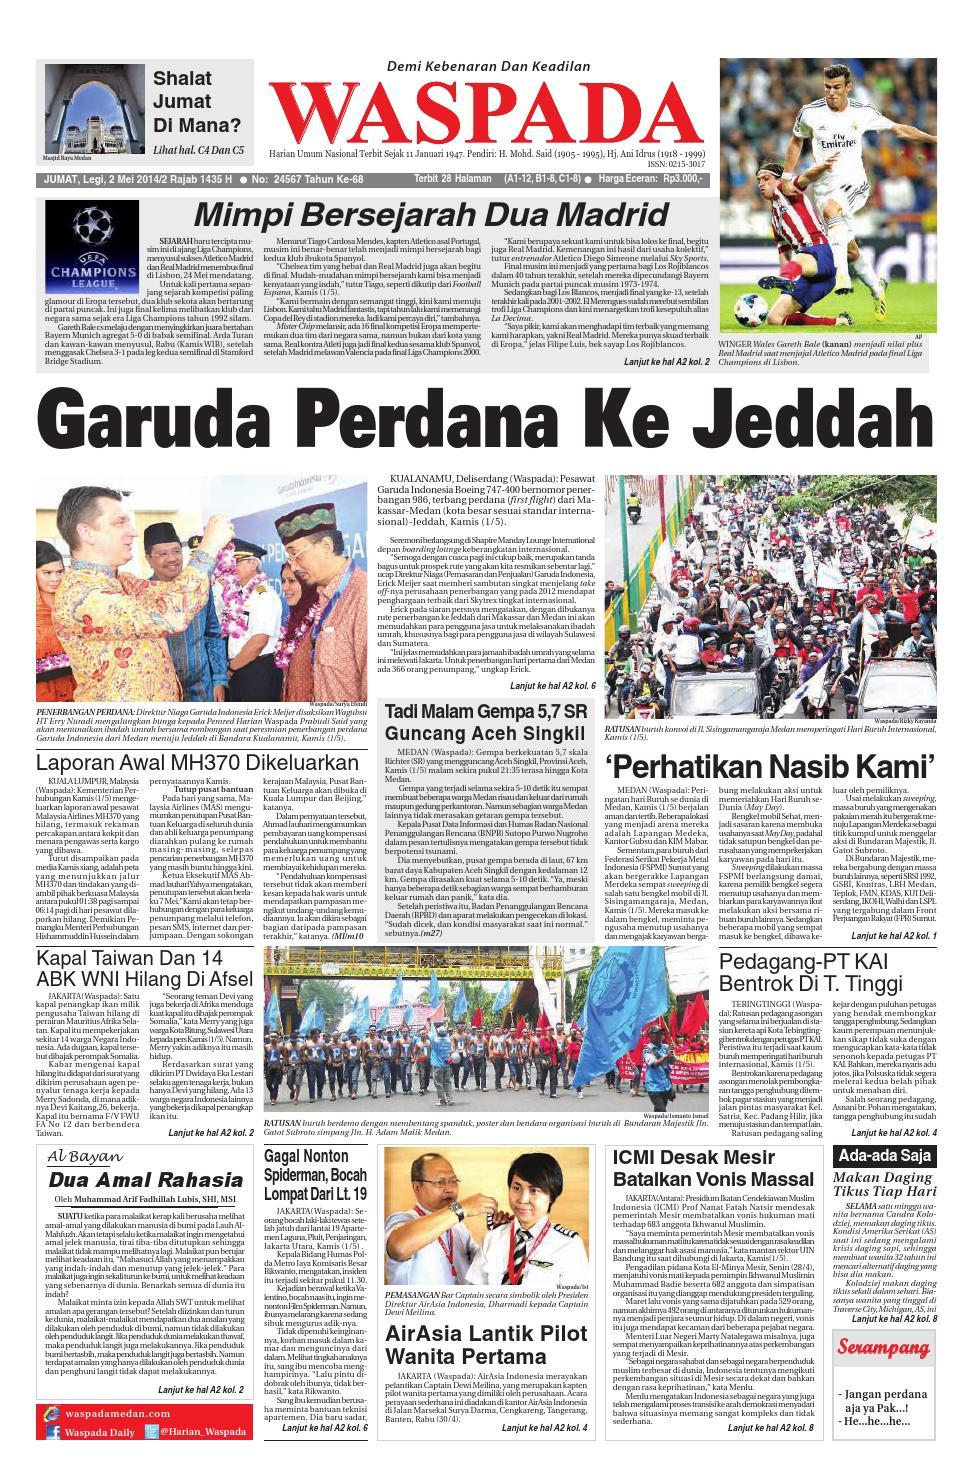 Waspada Jumat 2 Mei 2014 By Harian Issuu Charger Warna Warni Merk Hasan Sj0048